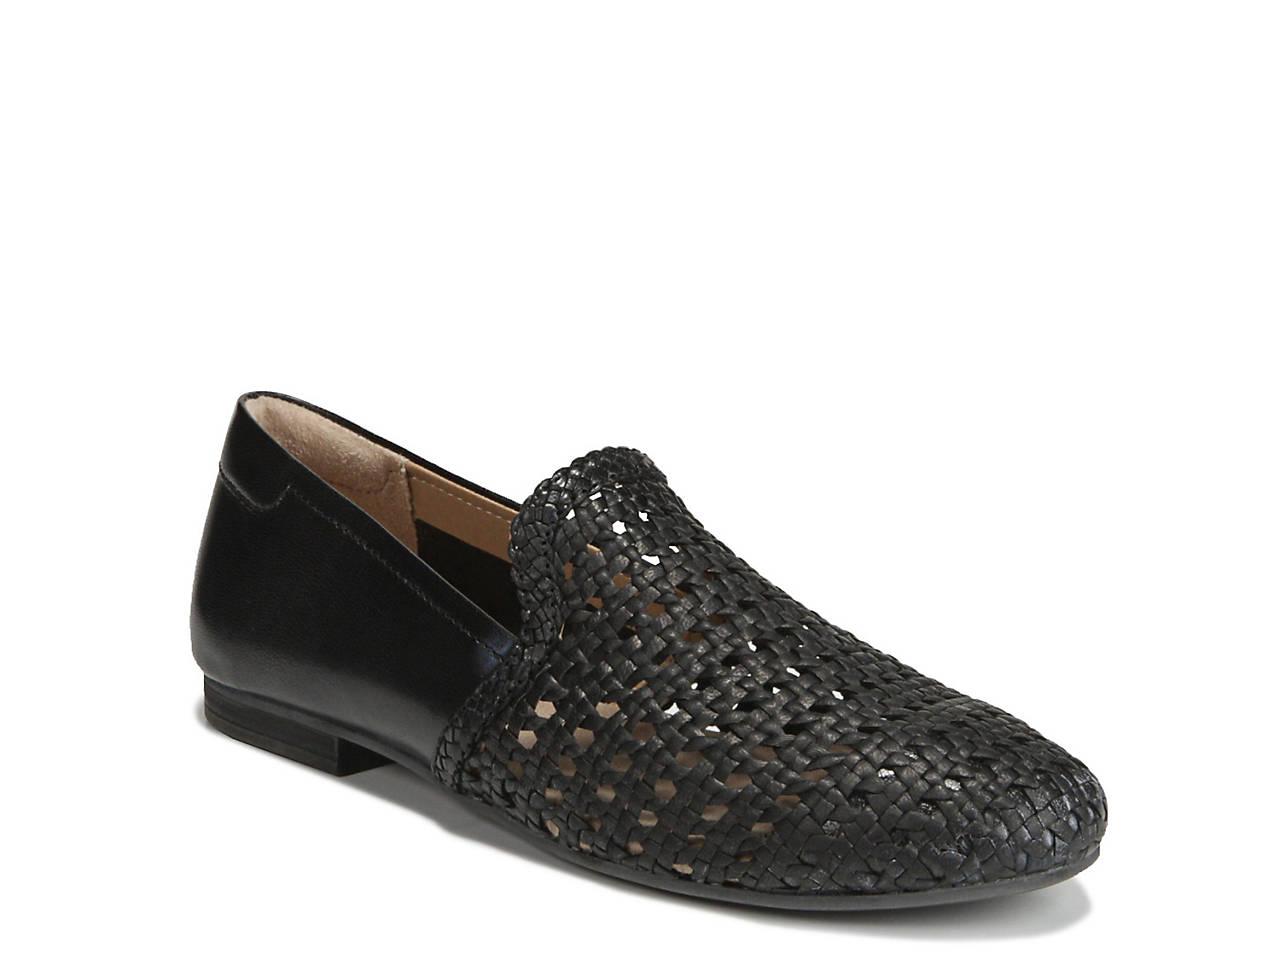 07434c0715 SOUL Naturalizer Alva Loafer Women s Shoes